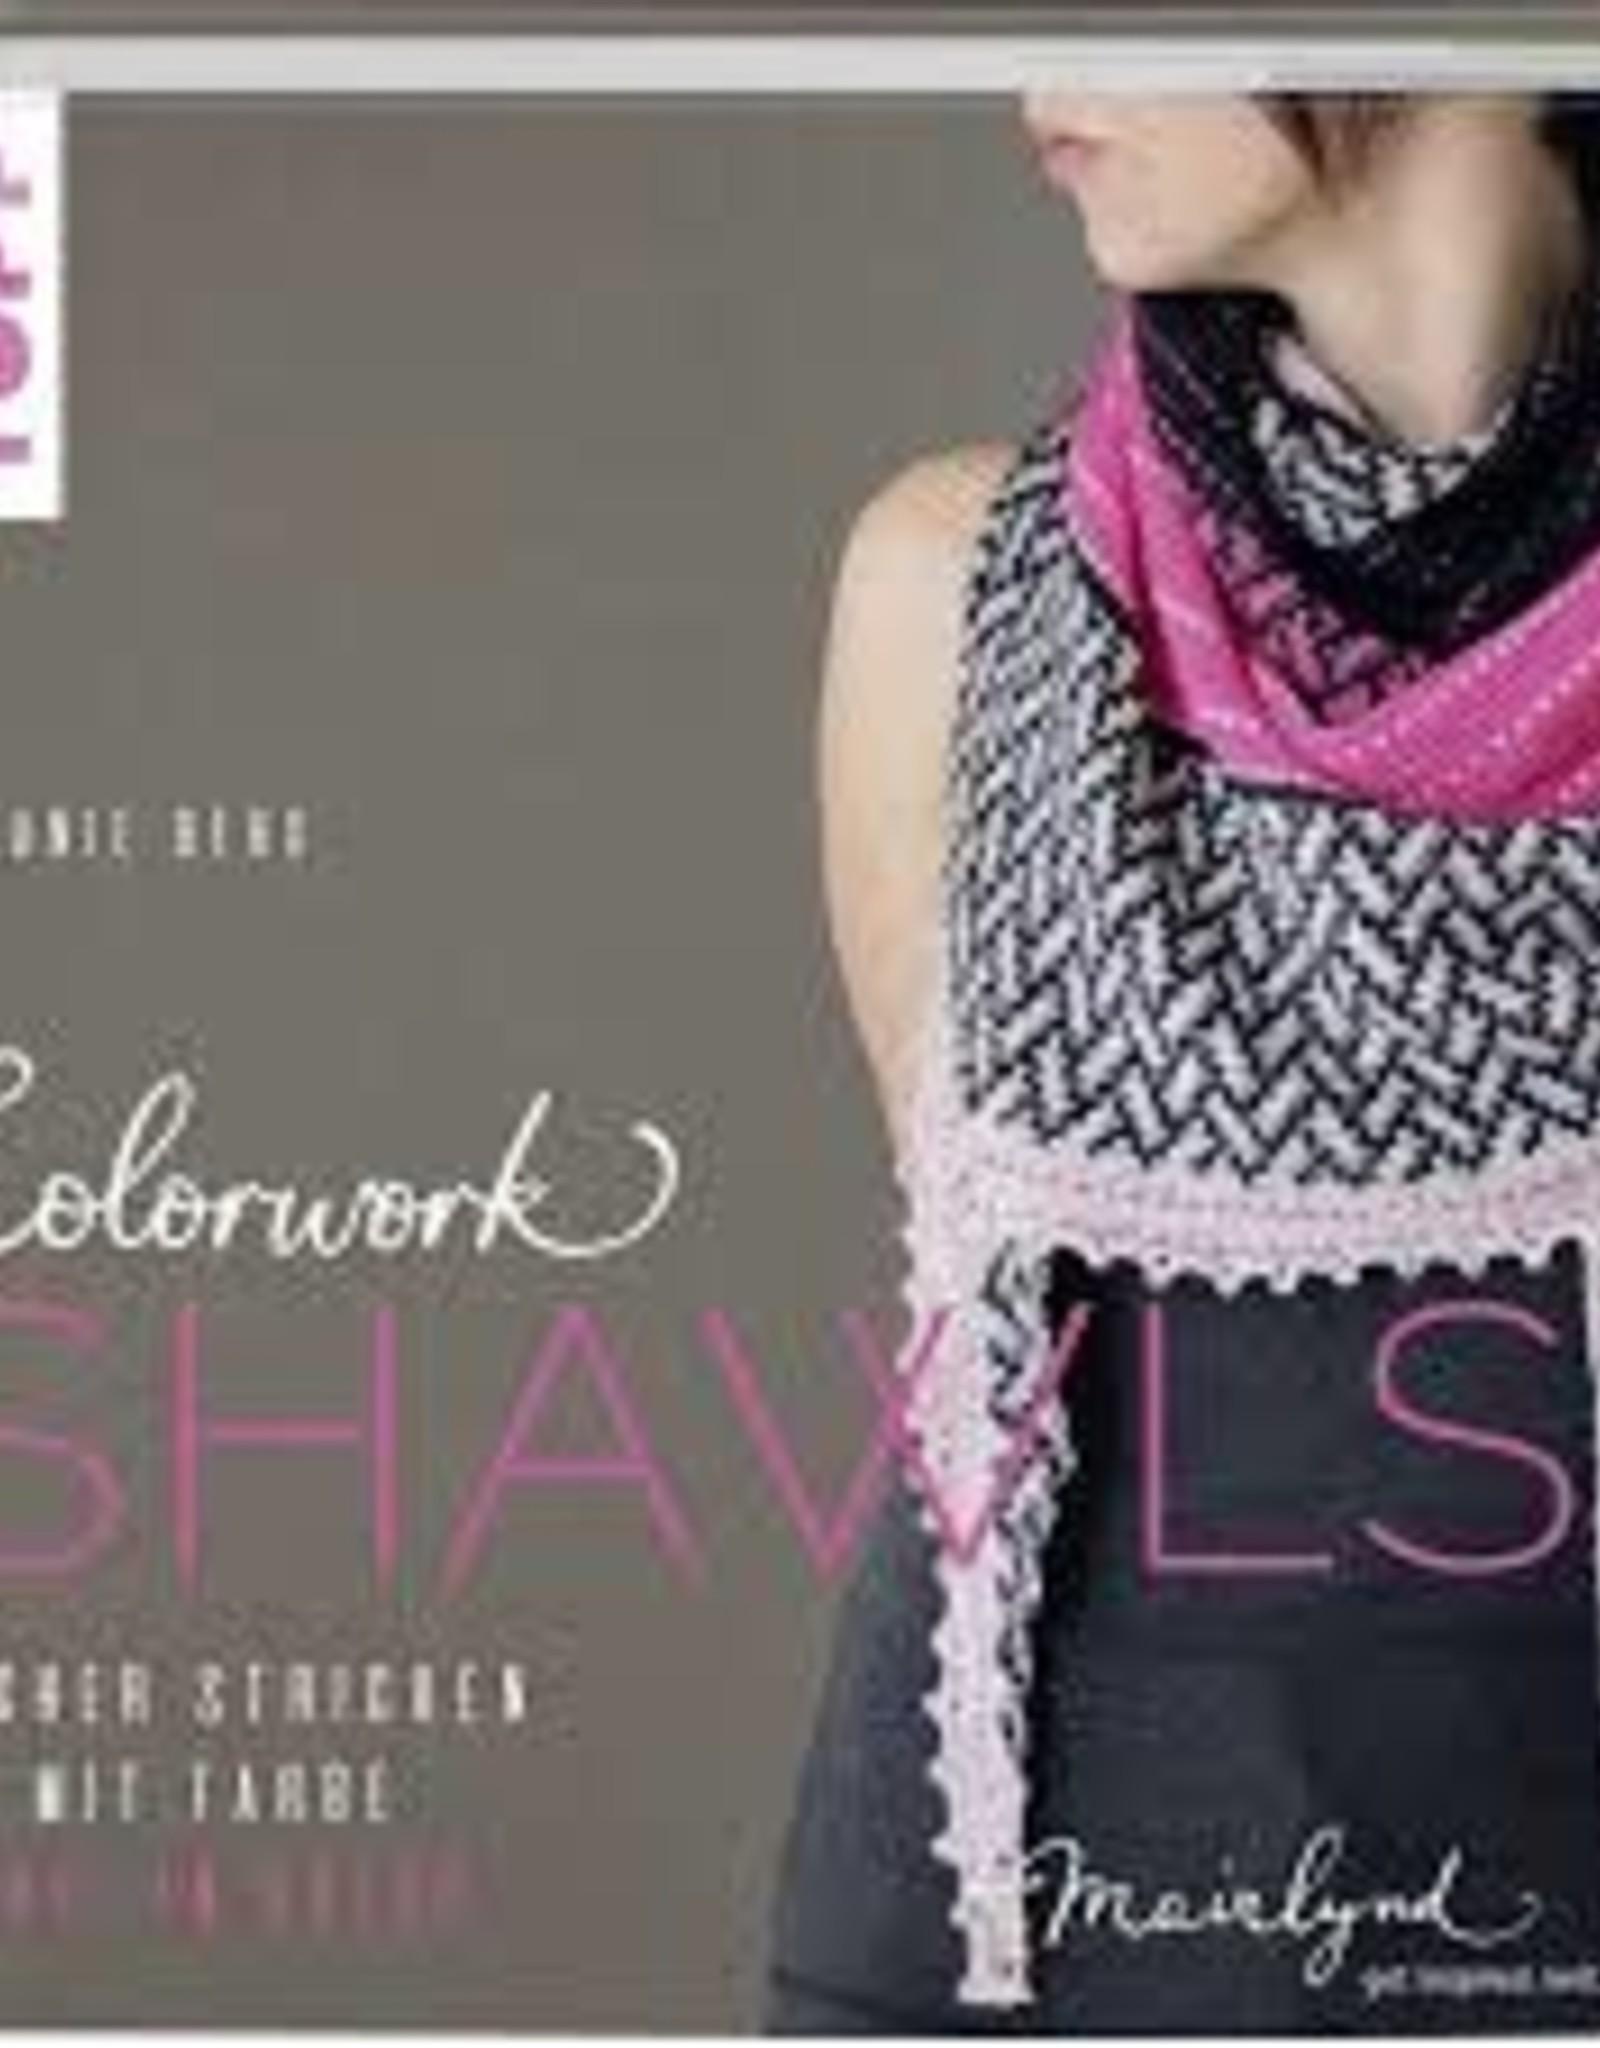 Book - Shawls Colourwork by Melanie Berg